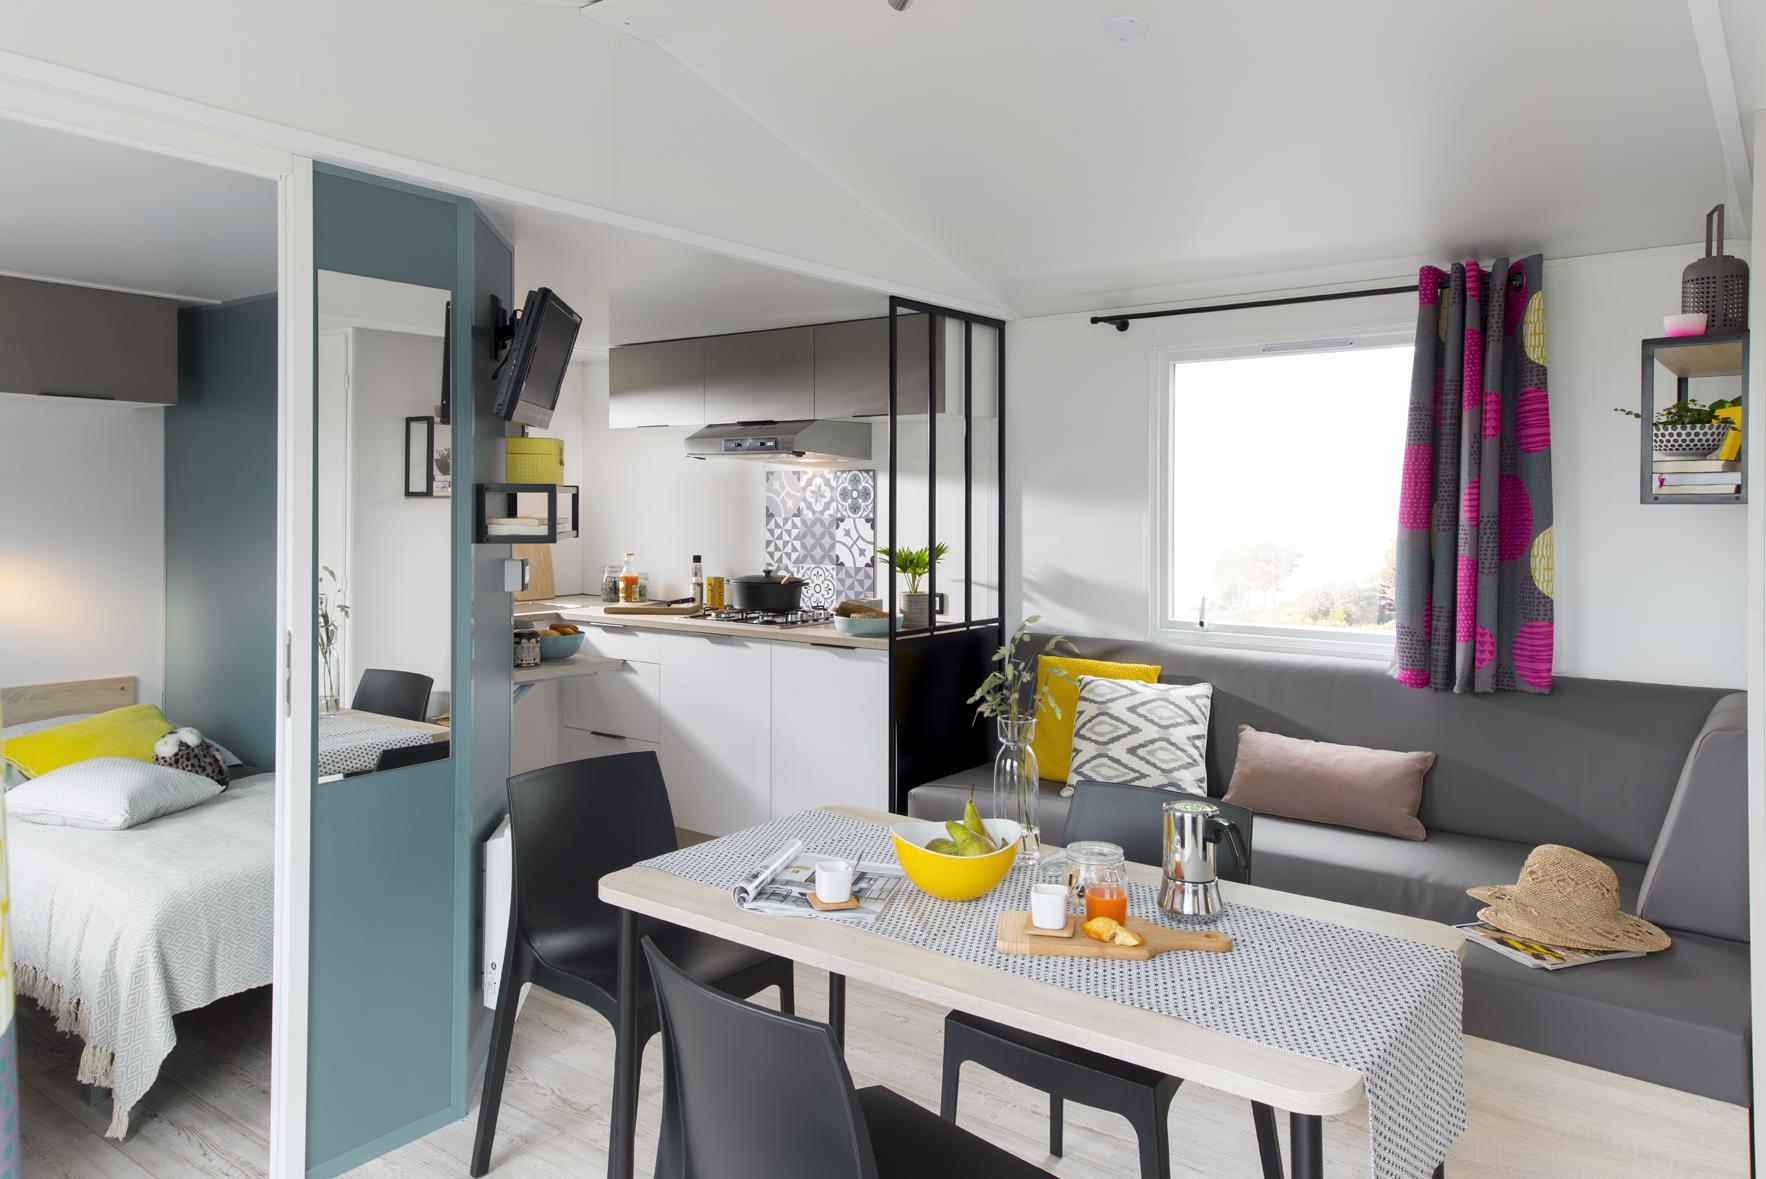 Location - Mobil Home Ciela Confort - 30M² - 2 Chambres  -  Climatisation - Tv - Camping Terra Verdon-Ciela Village